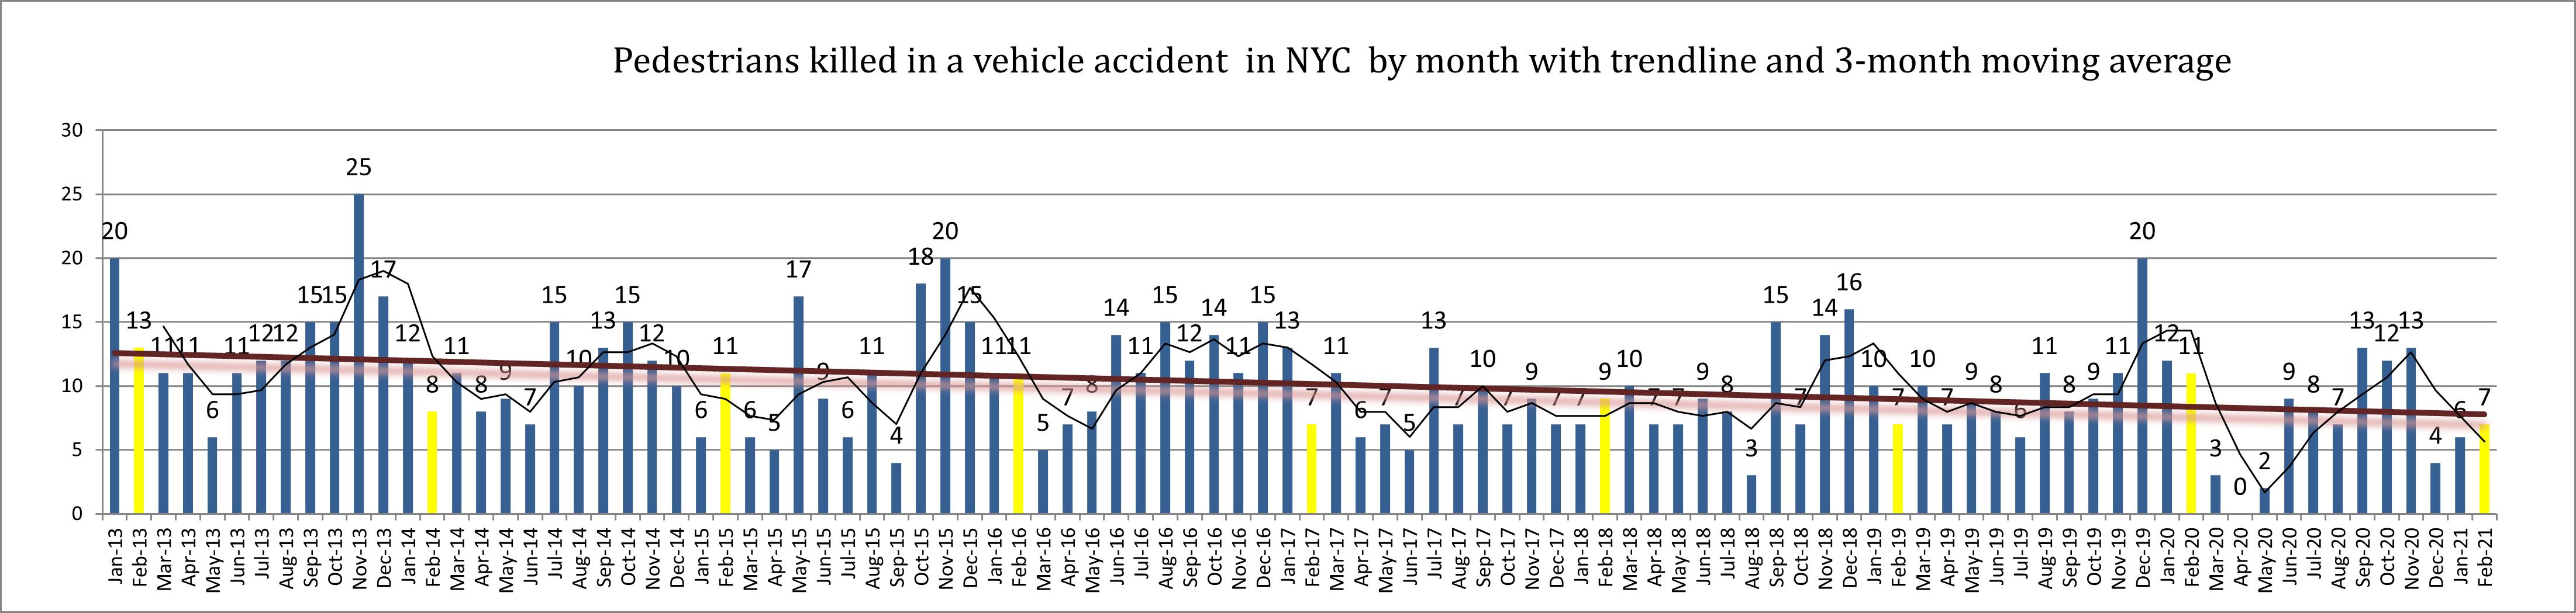 New york pedestrian deaths February 2021